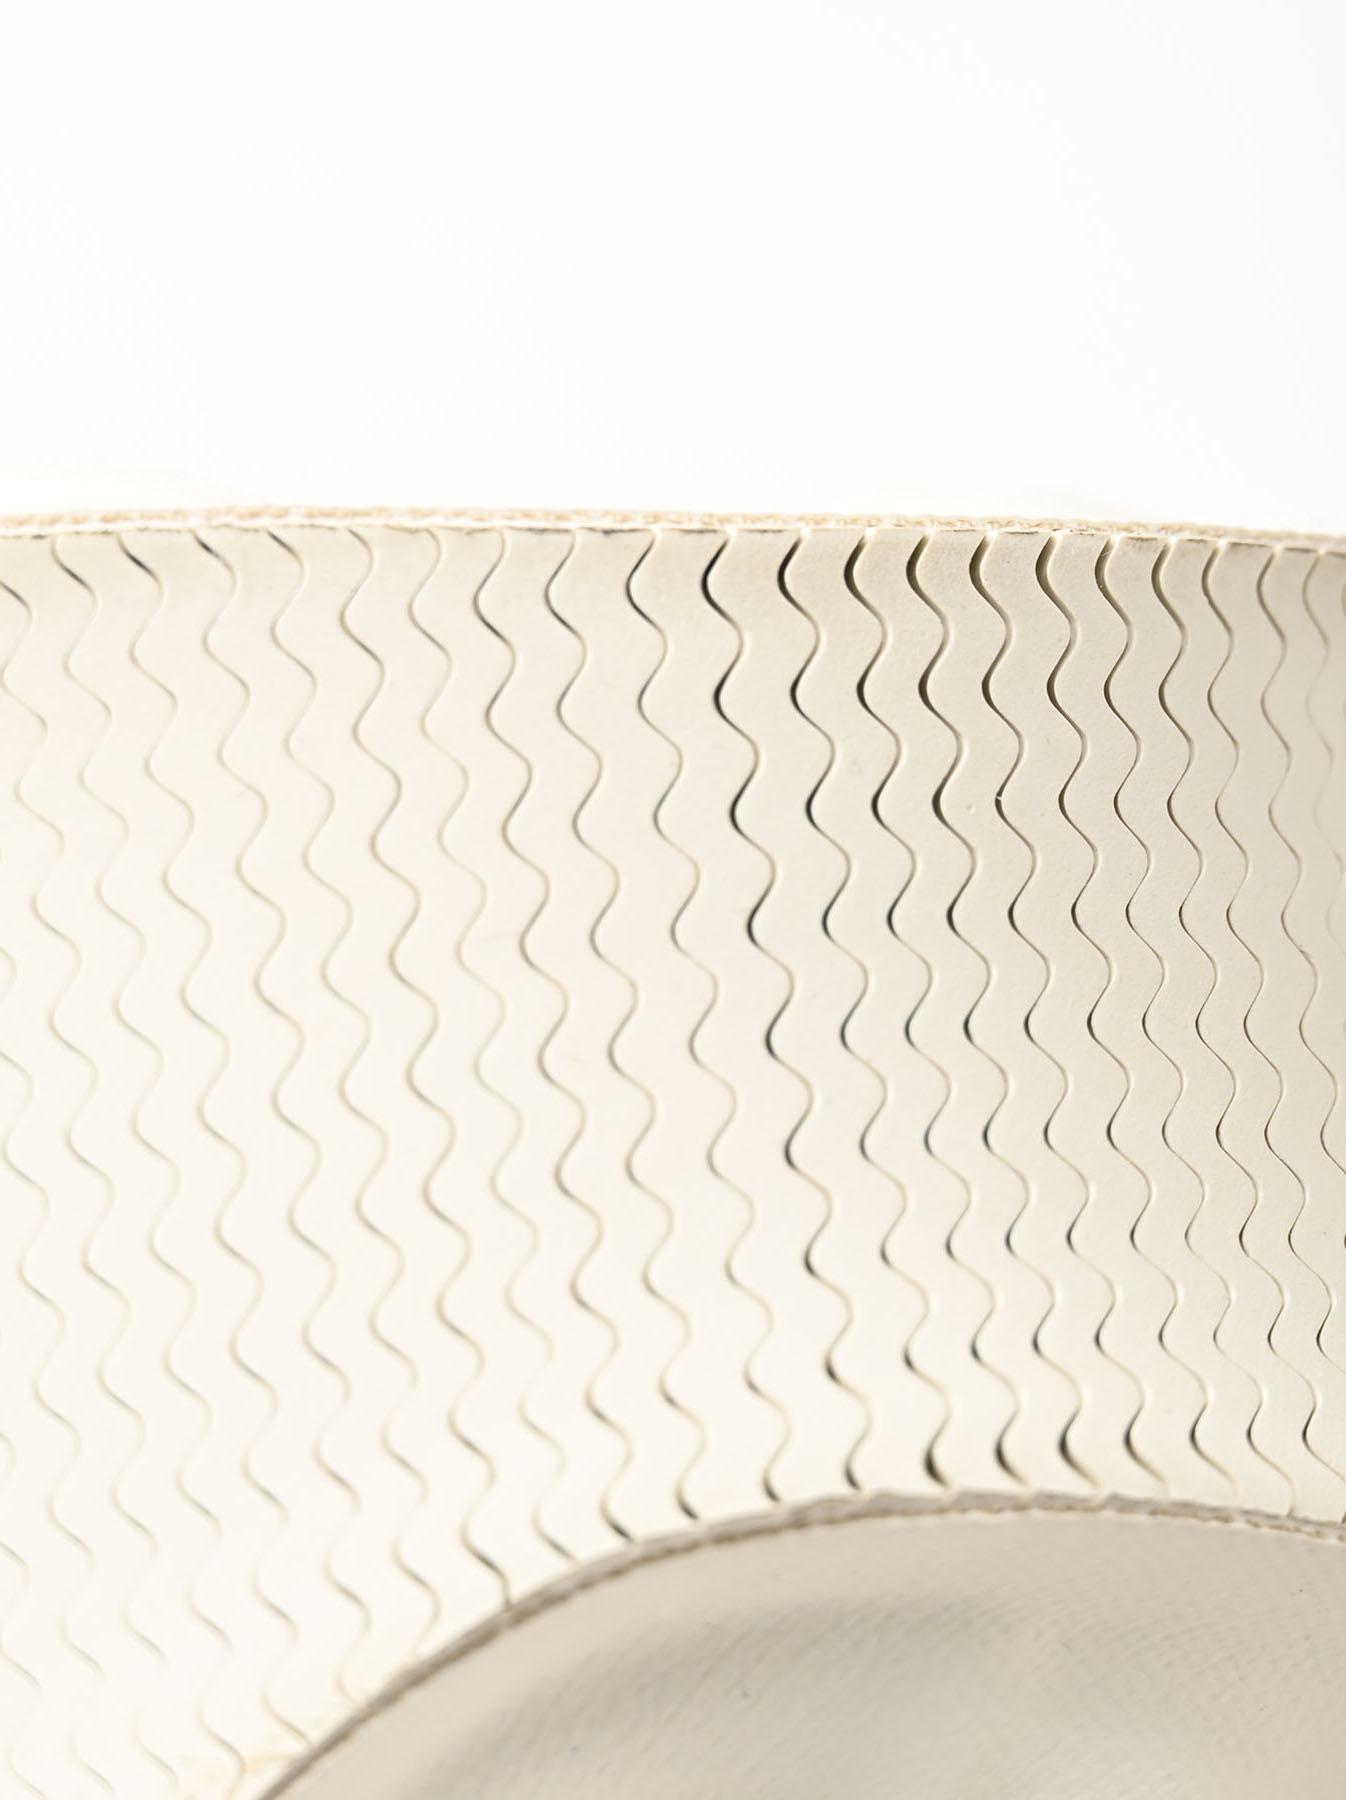 Indigo Linen Duck Sneaker size 5.5-7.5 UK-11